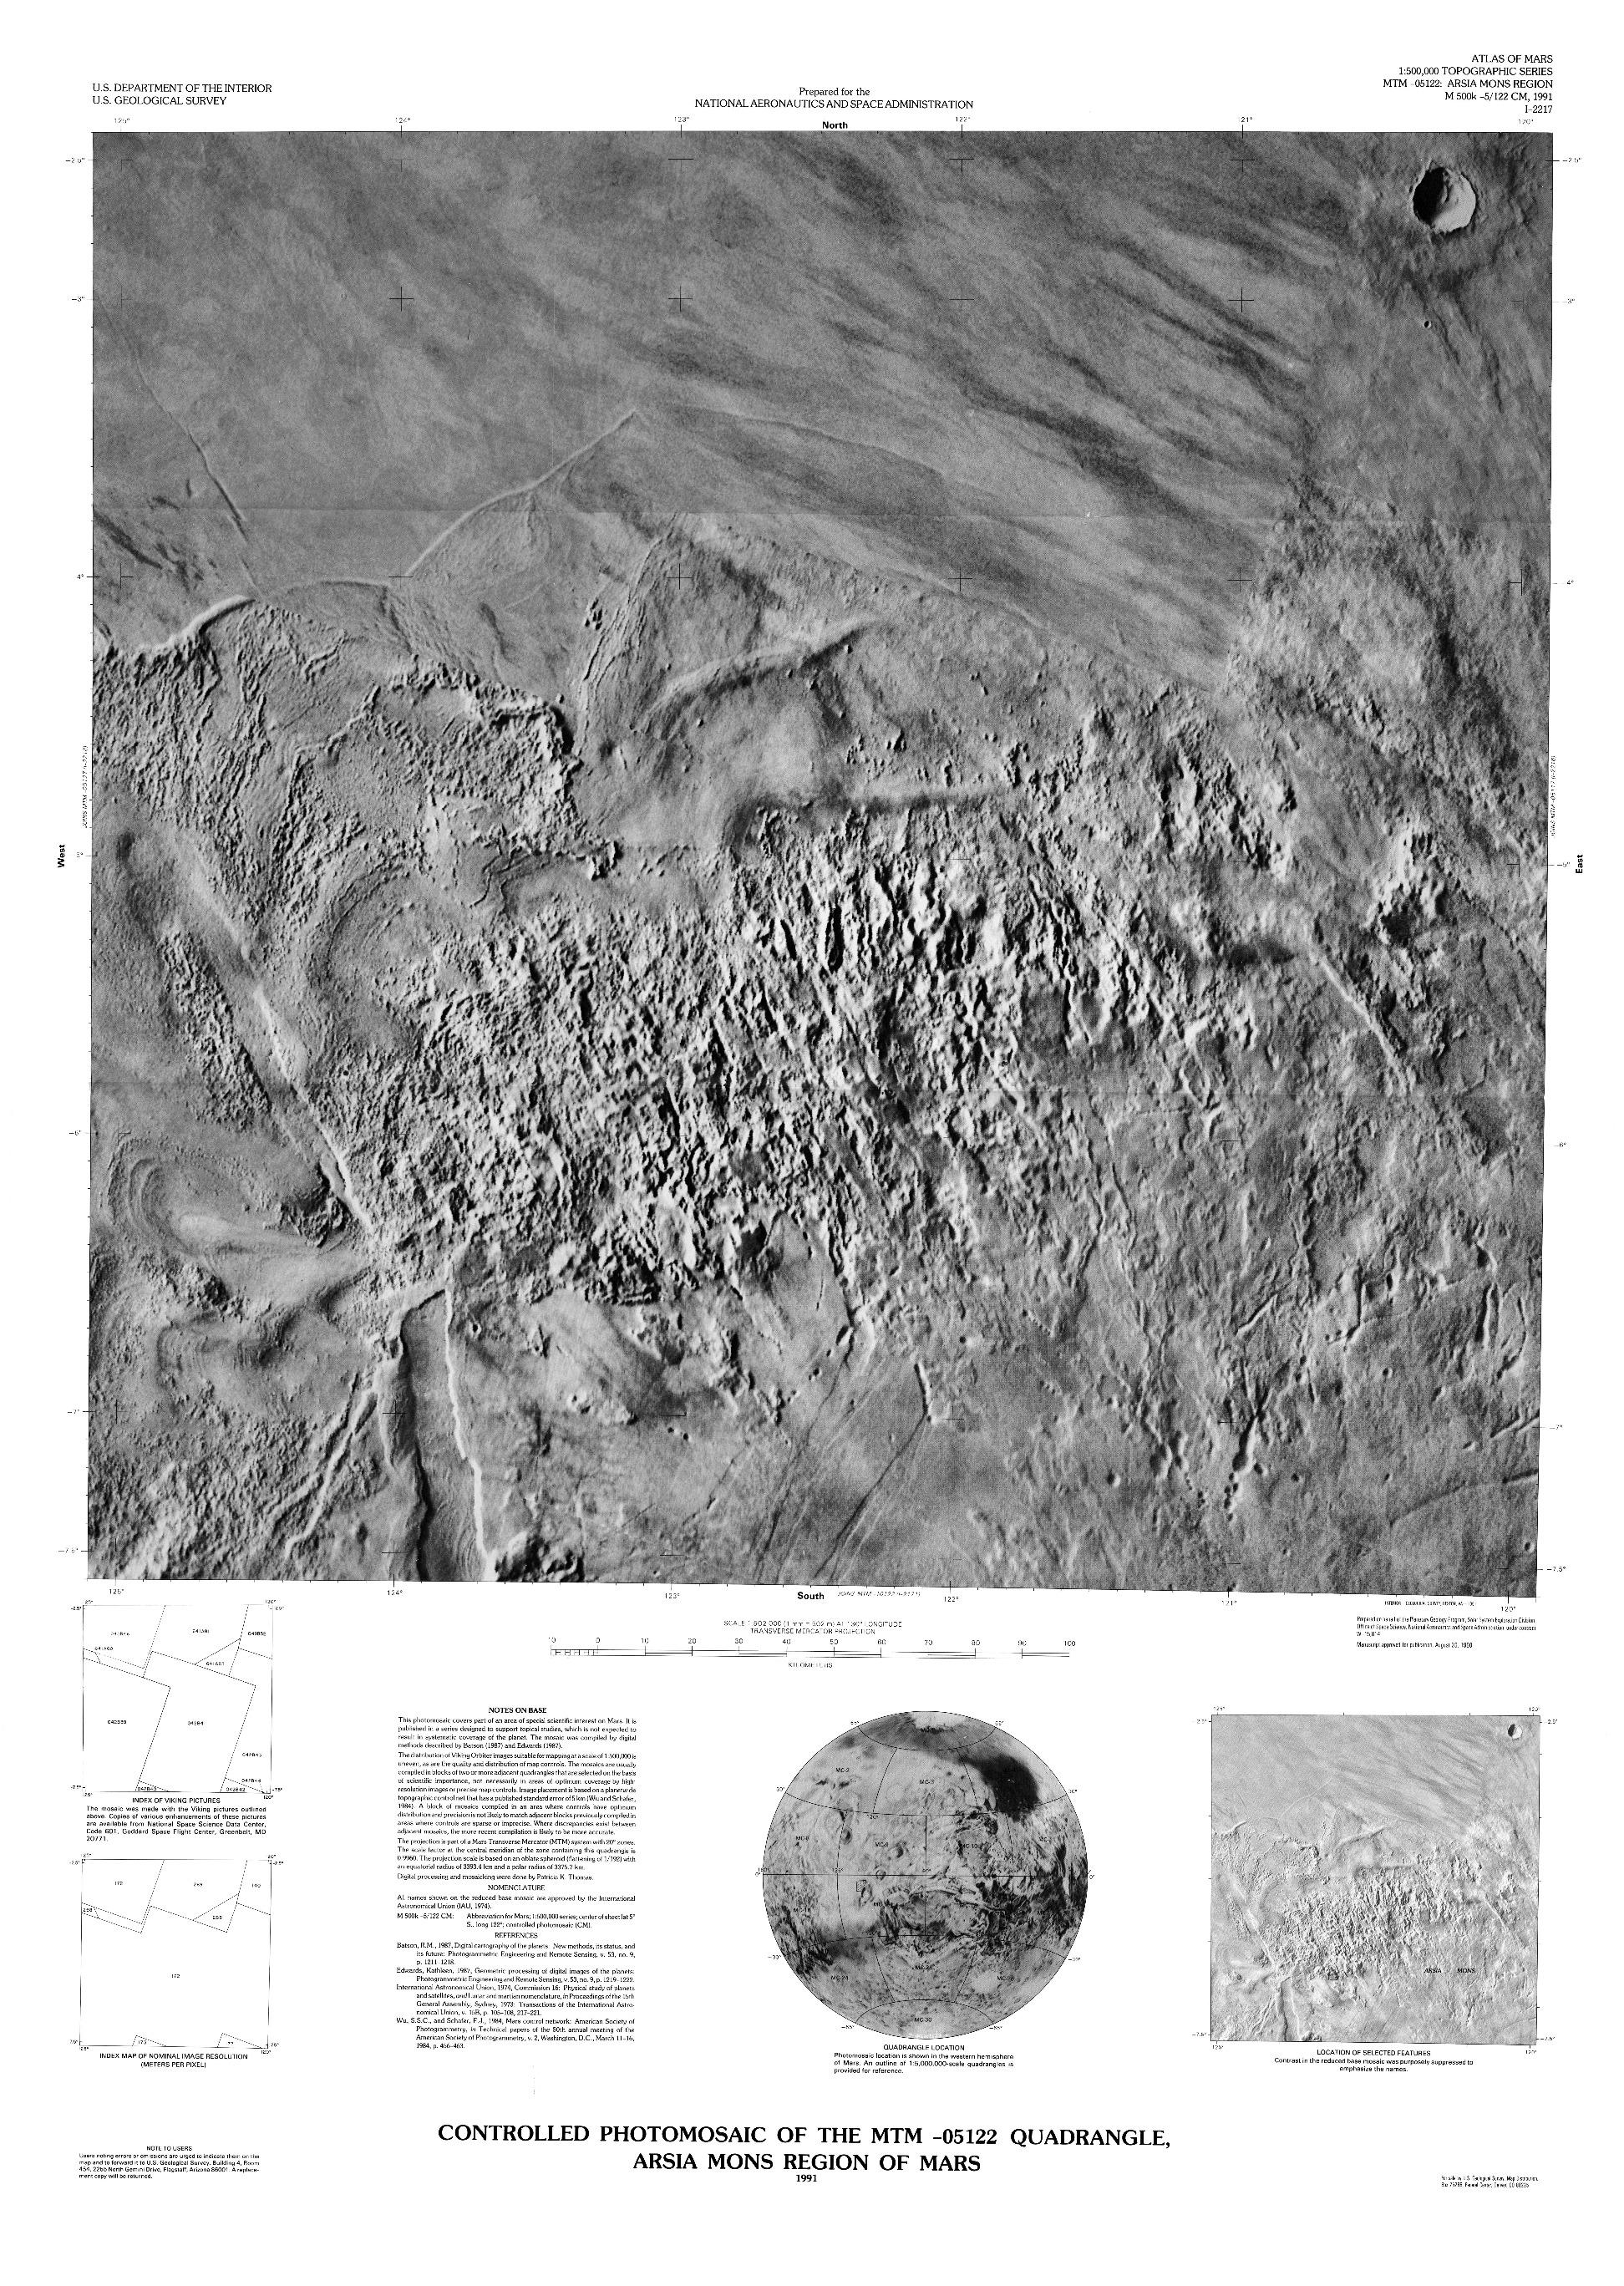 Mars Controlled Photomosaic of the MTM -05122 Quadrangle, Arsia Mons